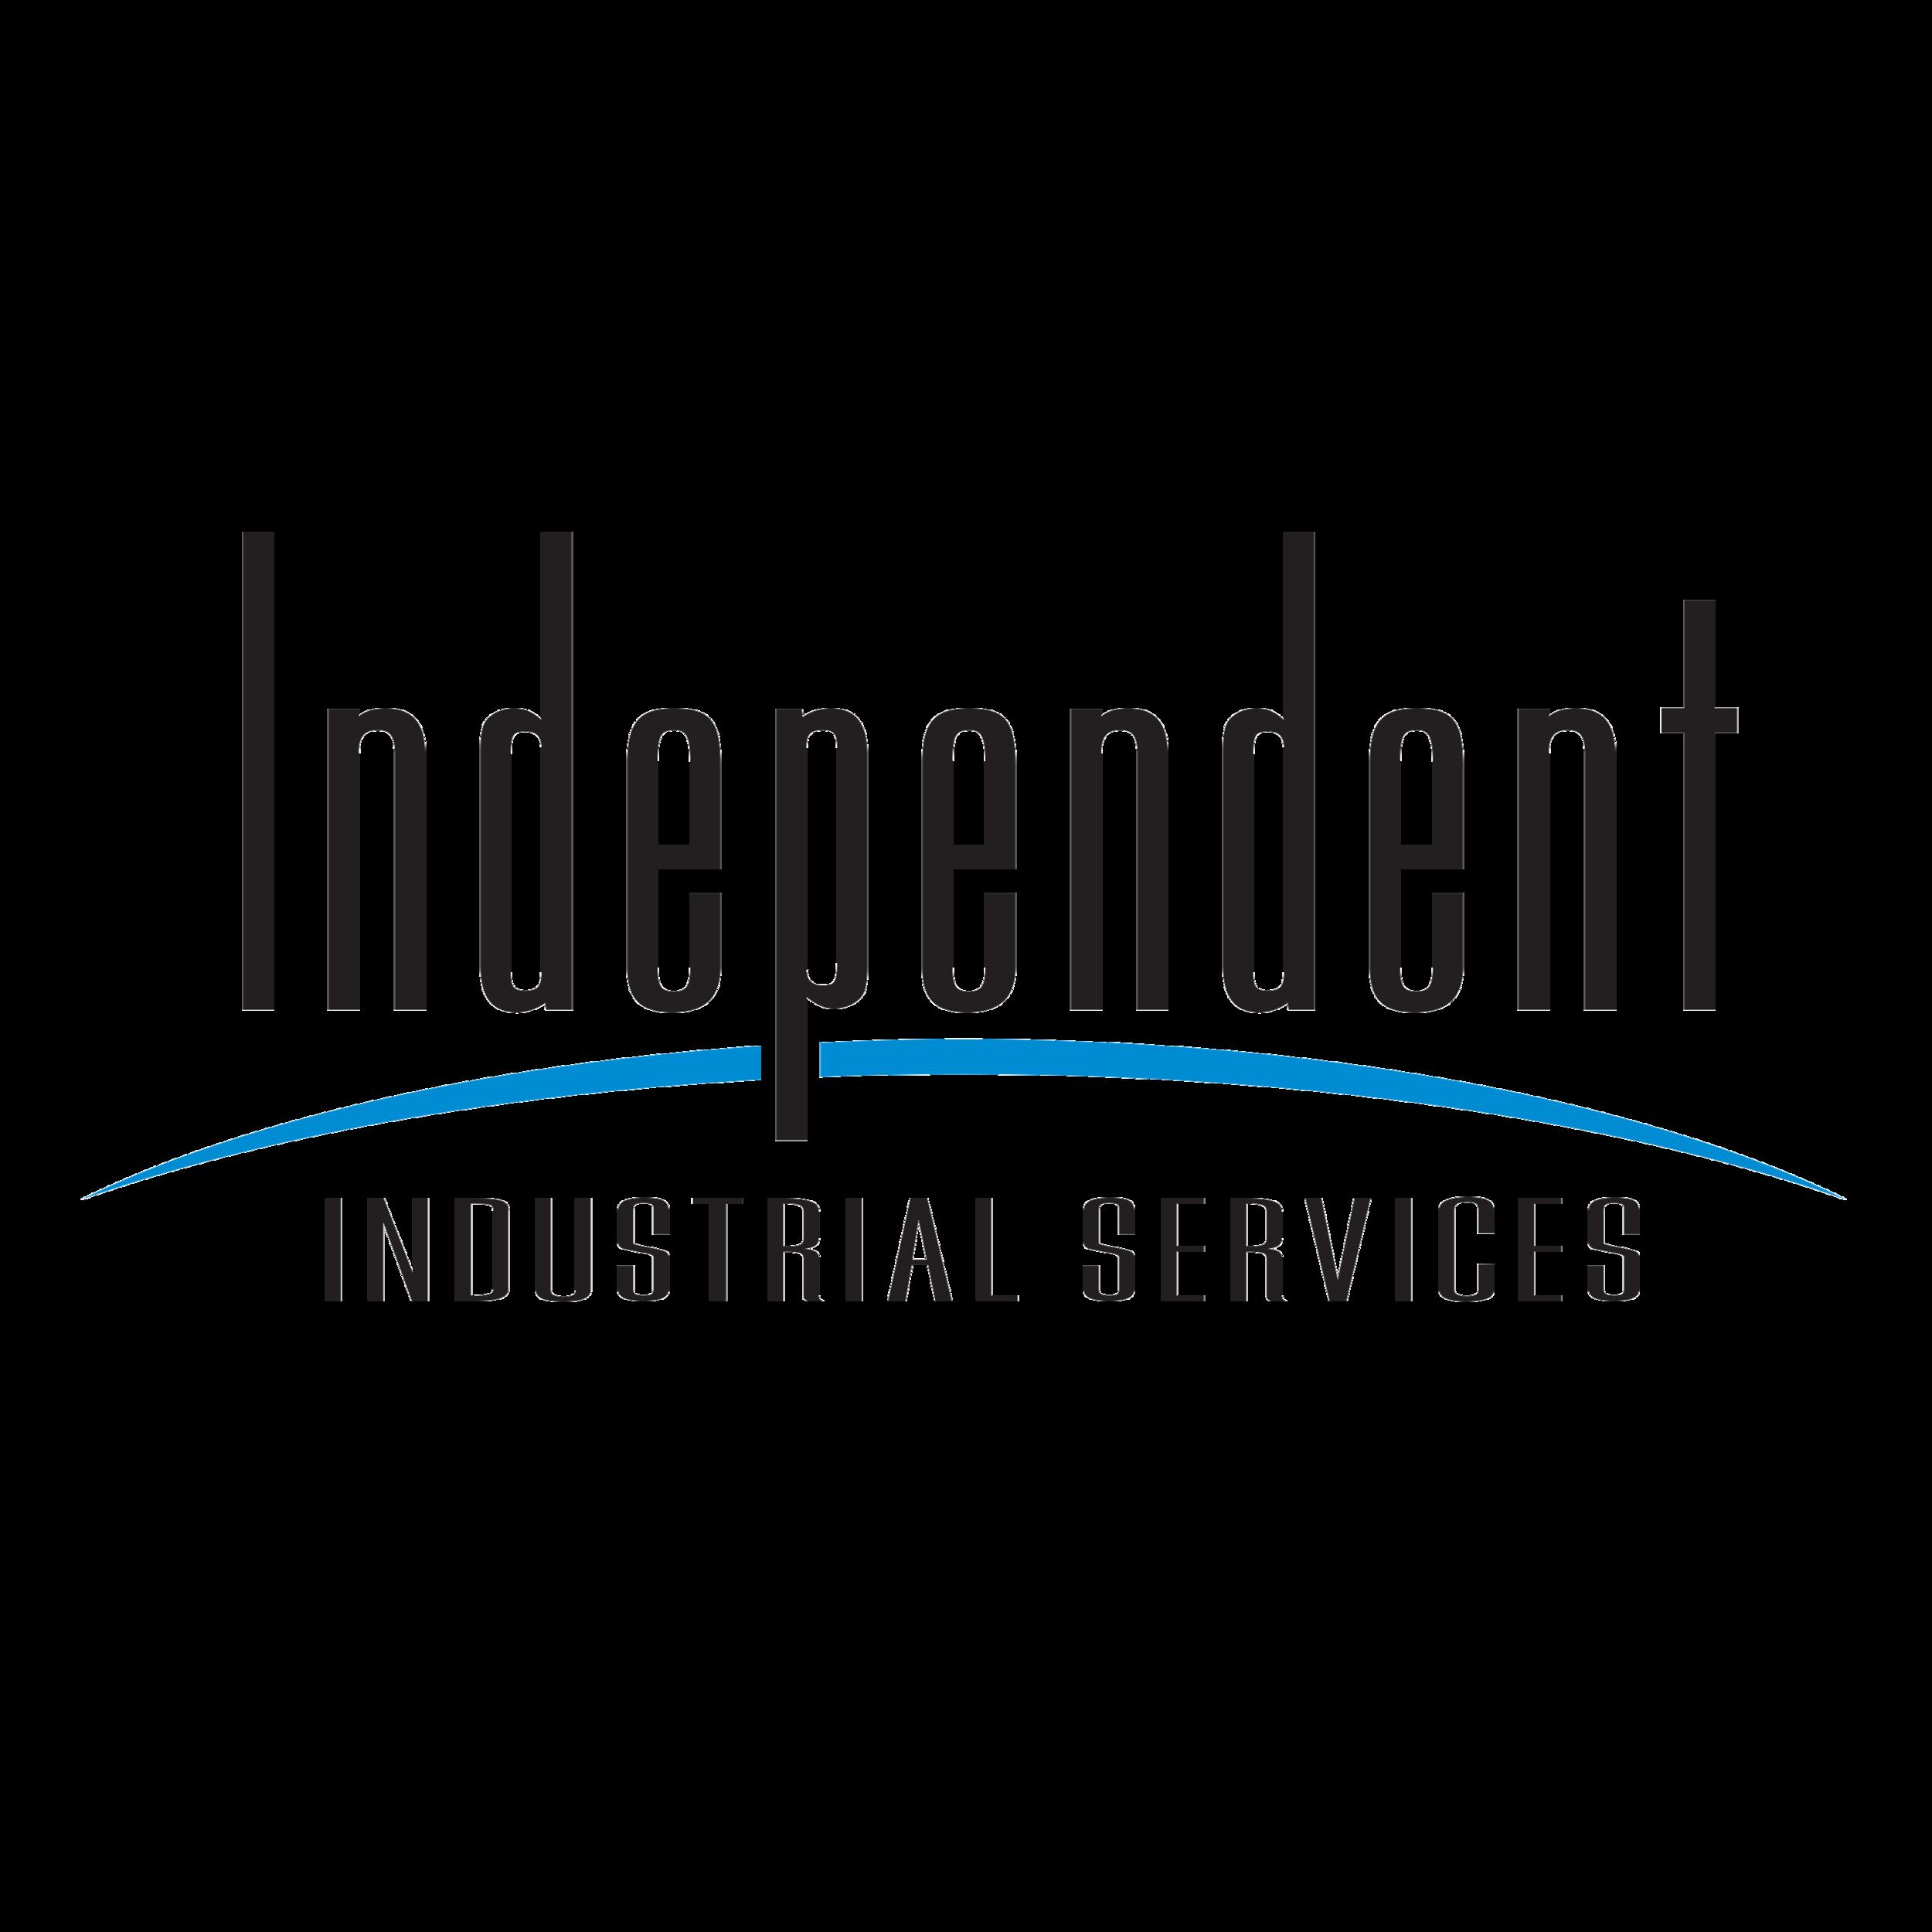 IndependentLogoTransparentBK.png